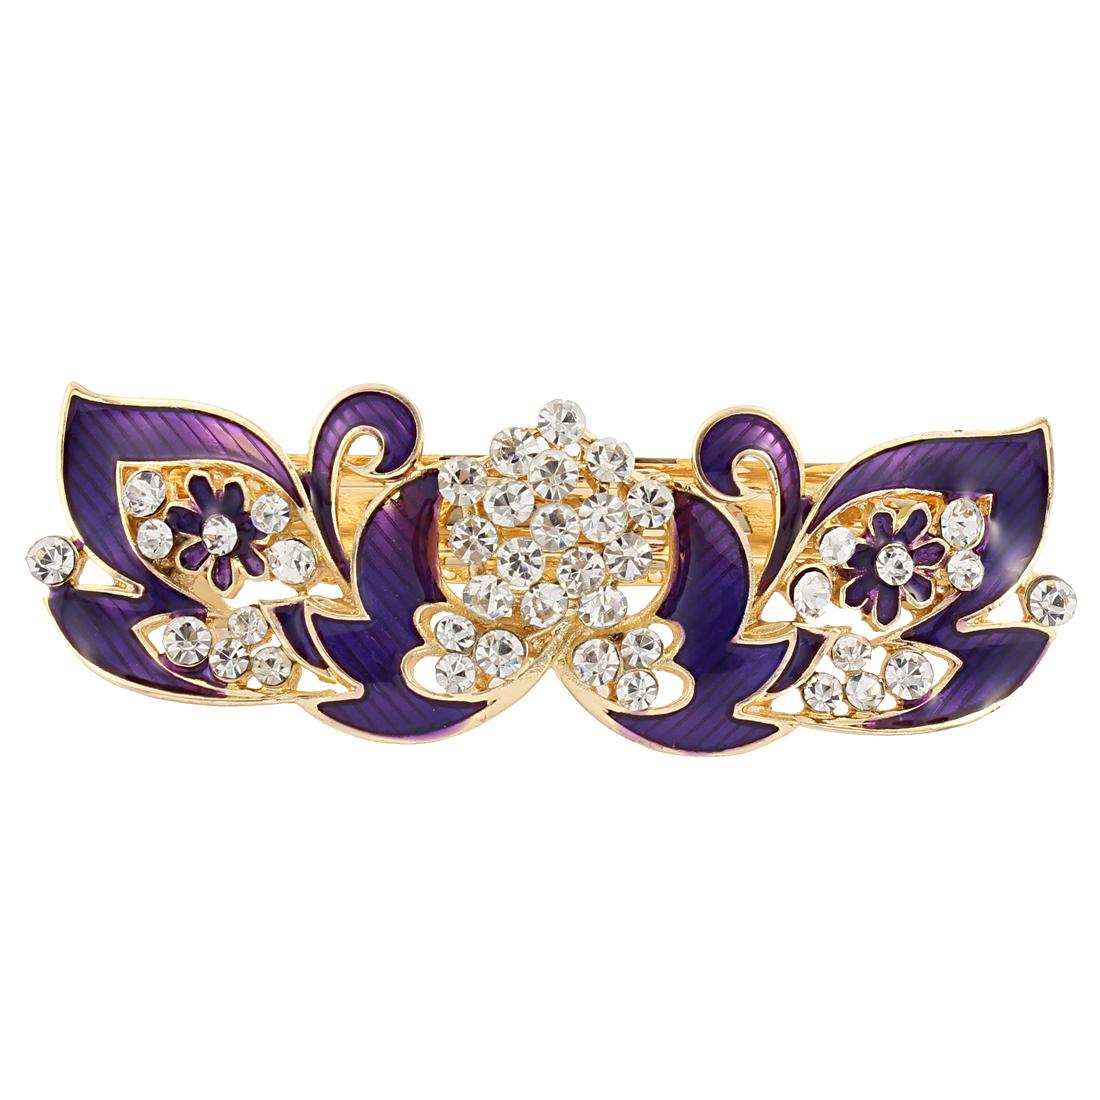 Lady Rhinestone Detail Flower Design French Hair Barrette Clip Purple